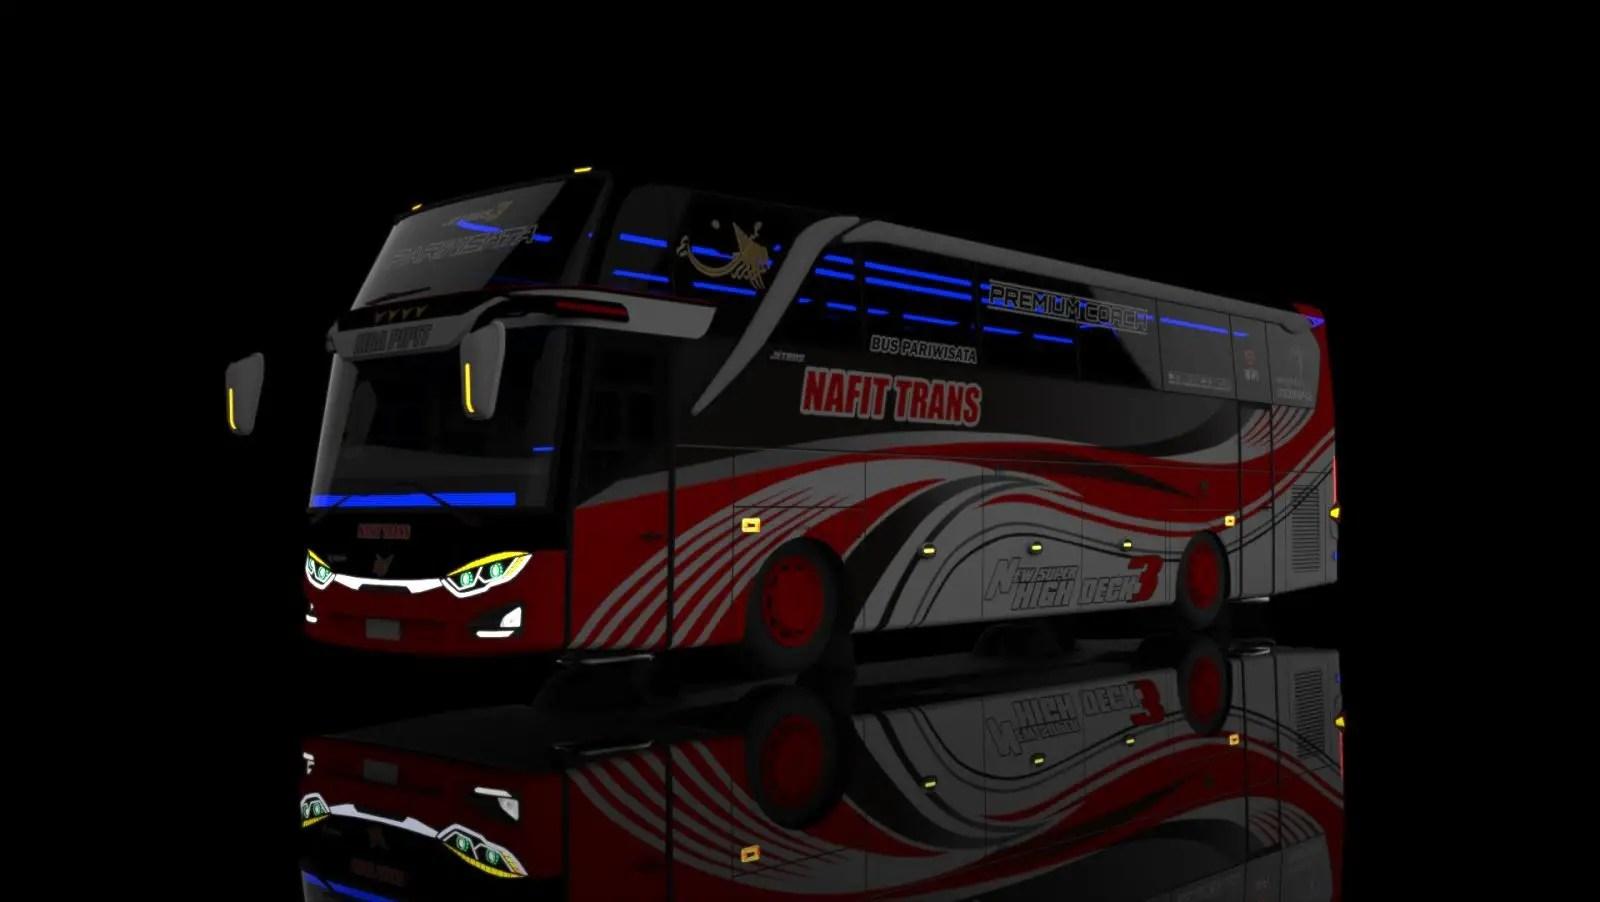 Download JB3 + SHD Bus Mod for Bus Simulator Indonesia, JB3 + SHD, Bus Mod, Bus Simulator Indonesia Mod, BUSSID mod, JB3 Mod, JB3 SHD bus Mod, JB3+ bus Mod, Mod for BUSSID, New Bus Mod, SGCArena, Vehicle Mod, WSPMods